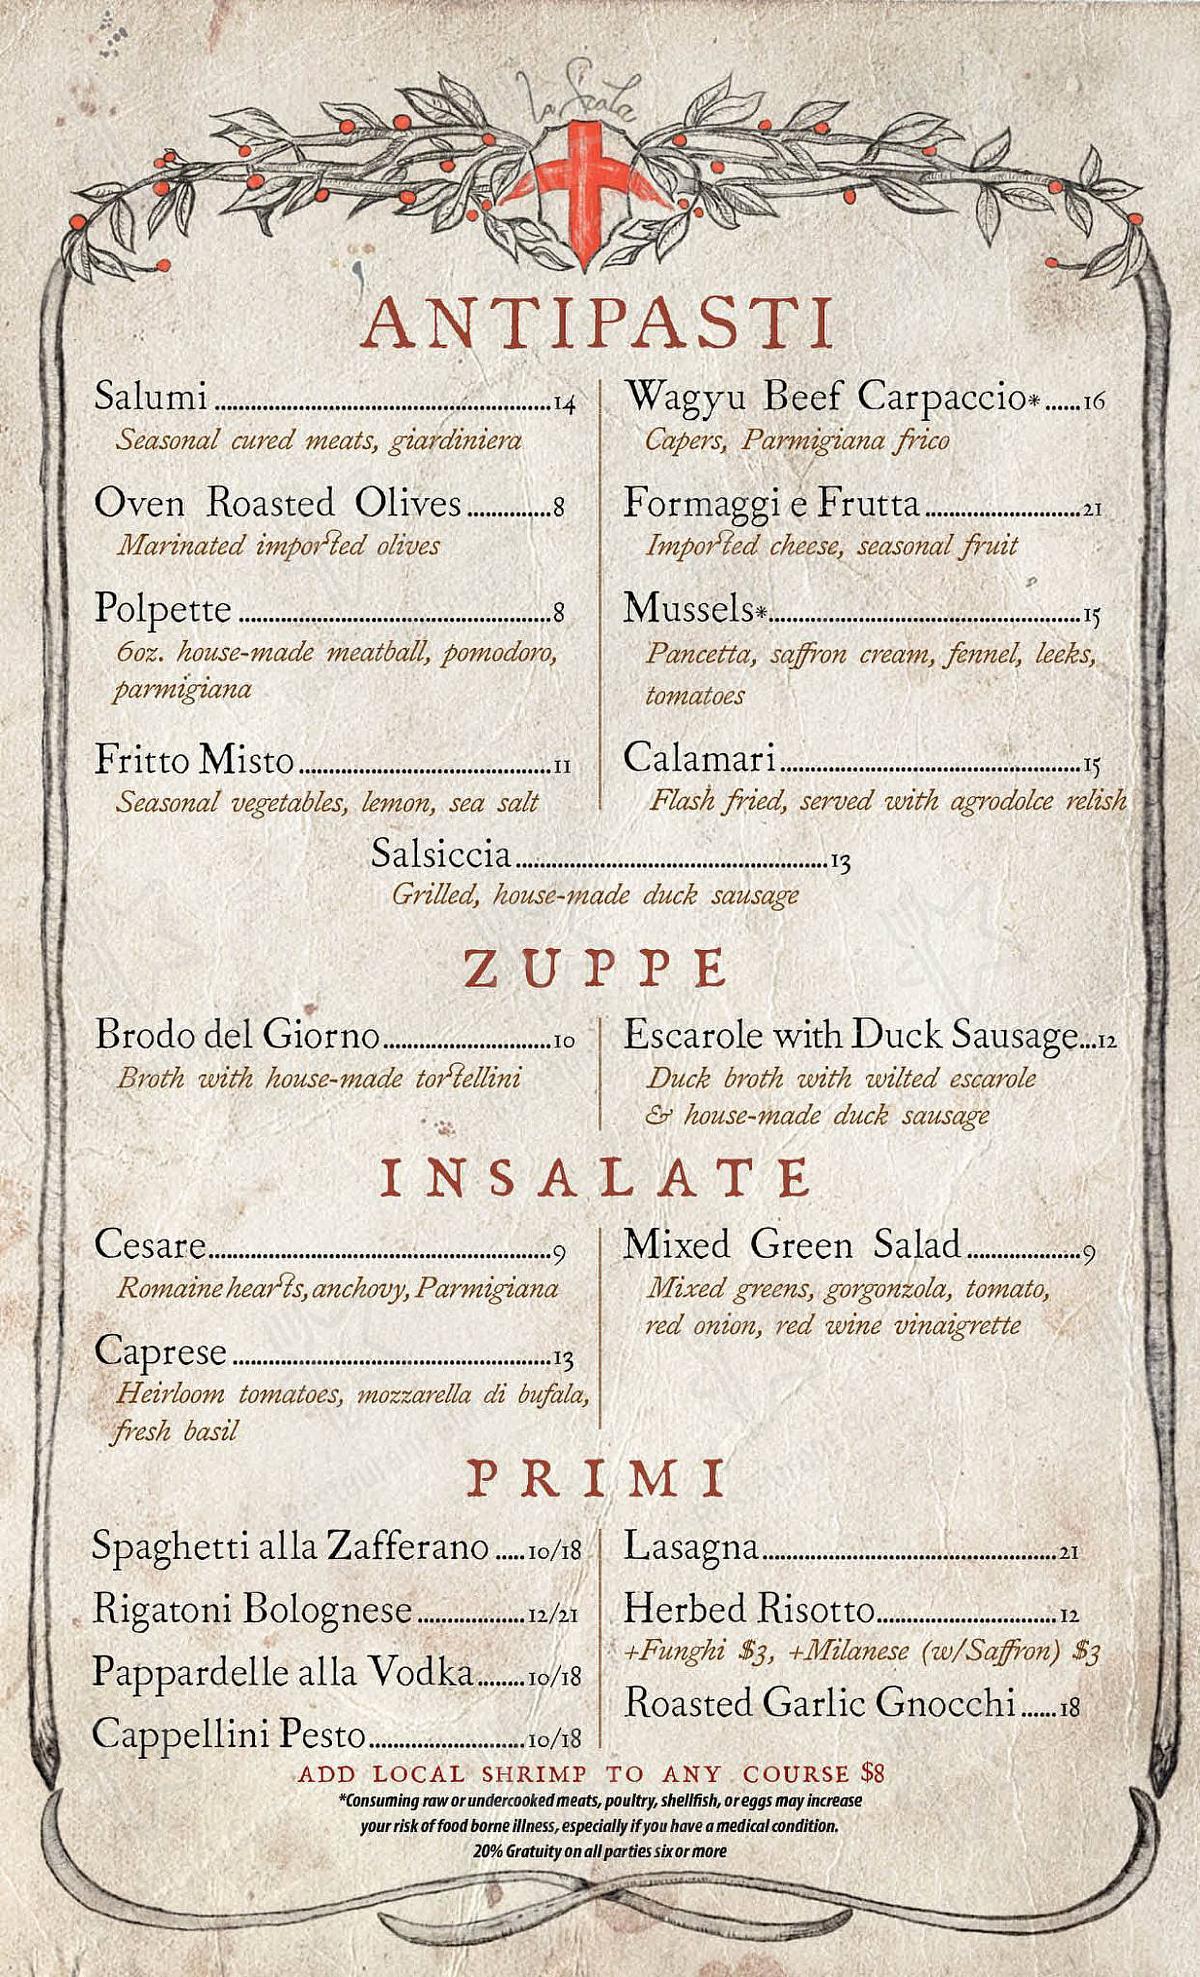 Взгляните на меню La Scala Ristorante